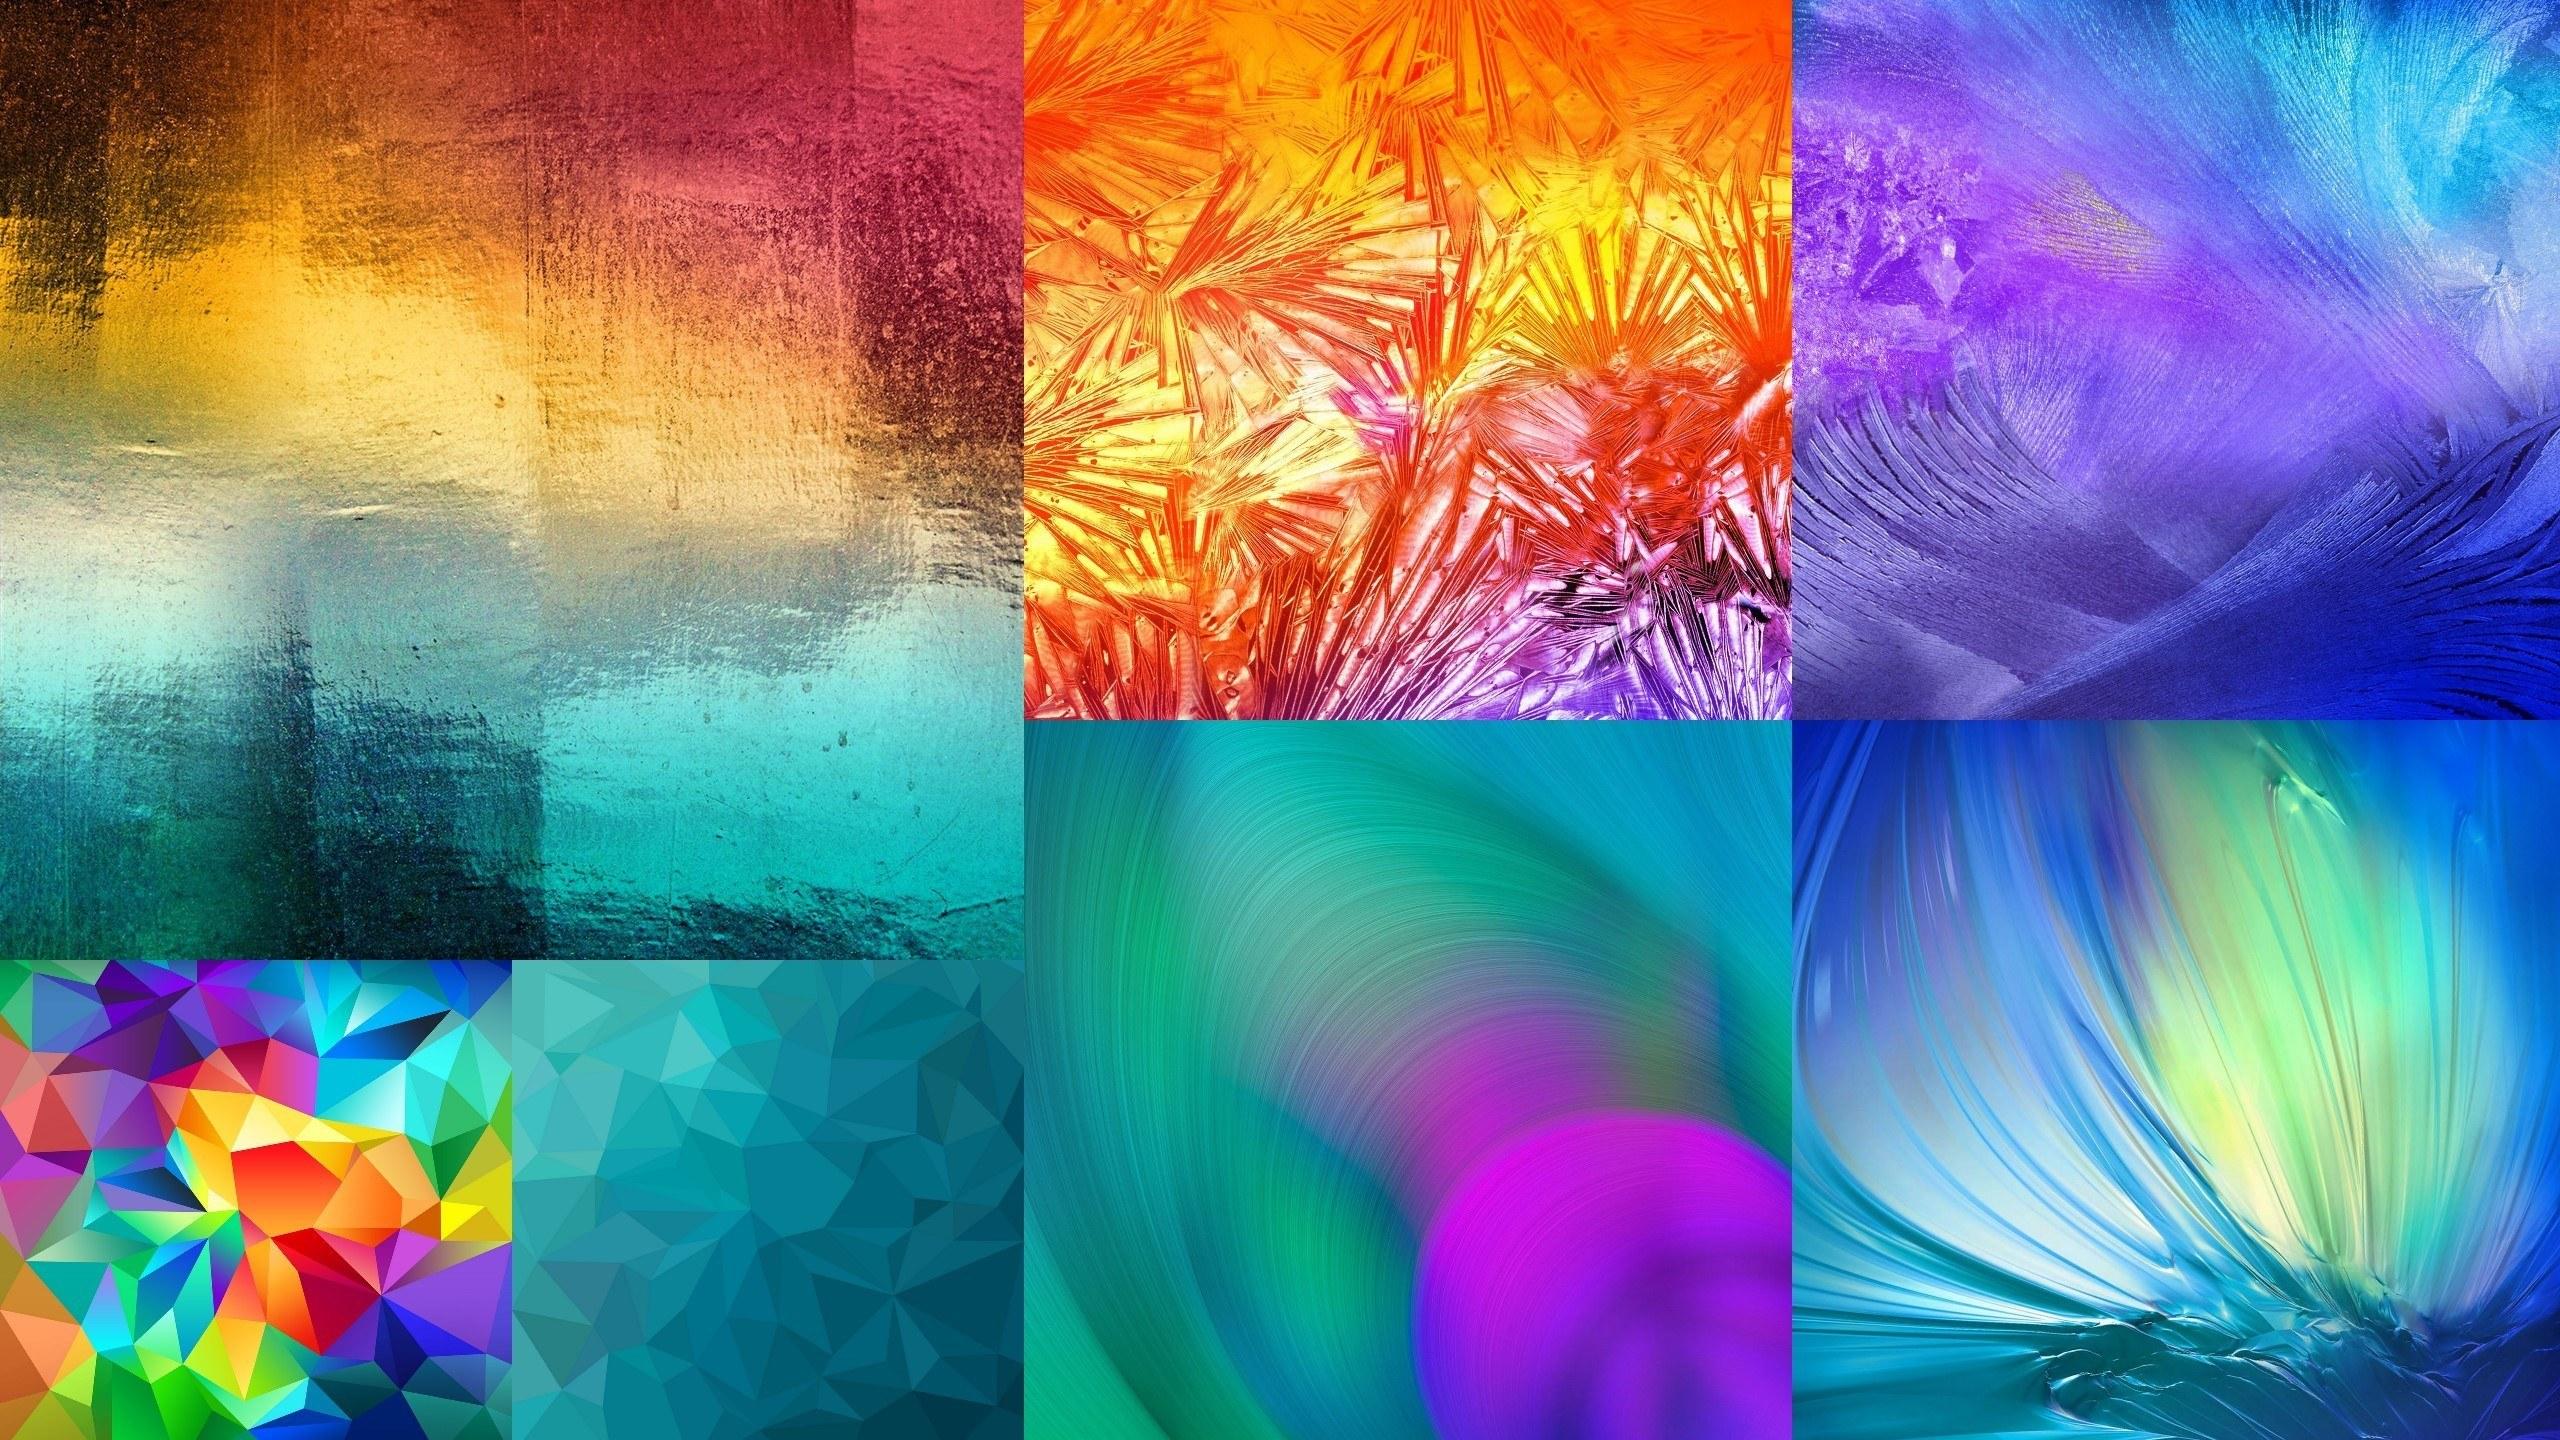 J2 J3 wallpapers